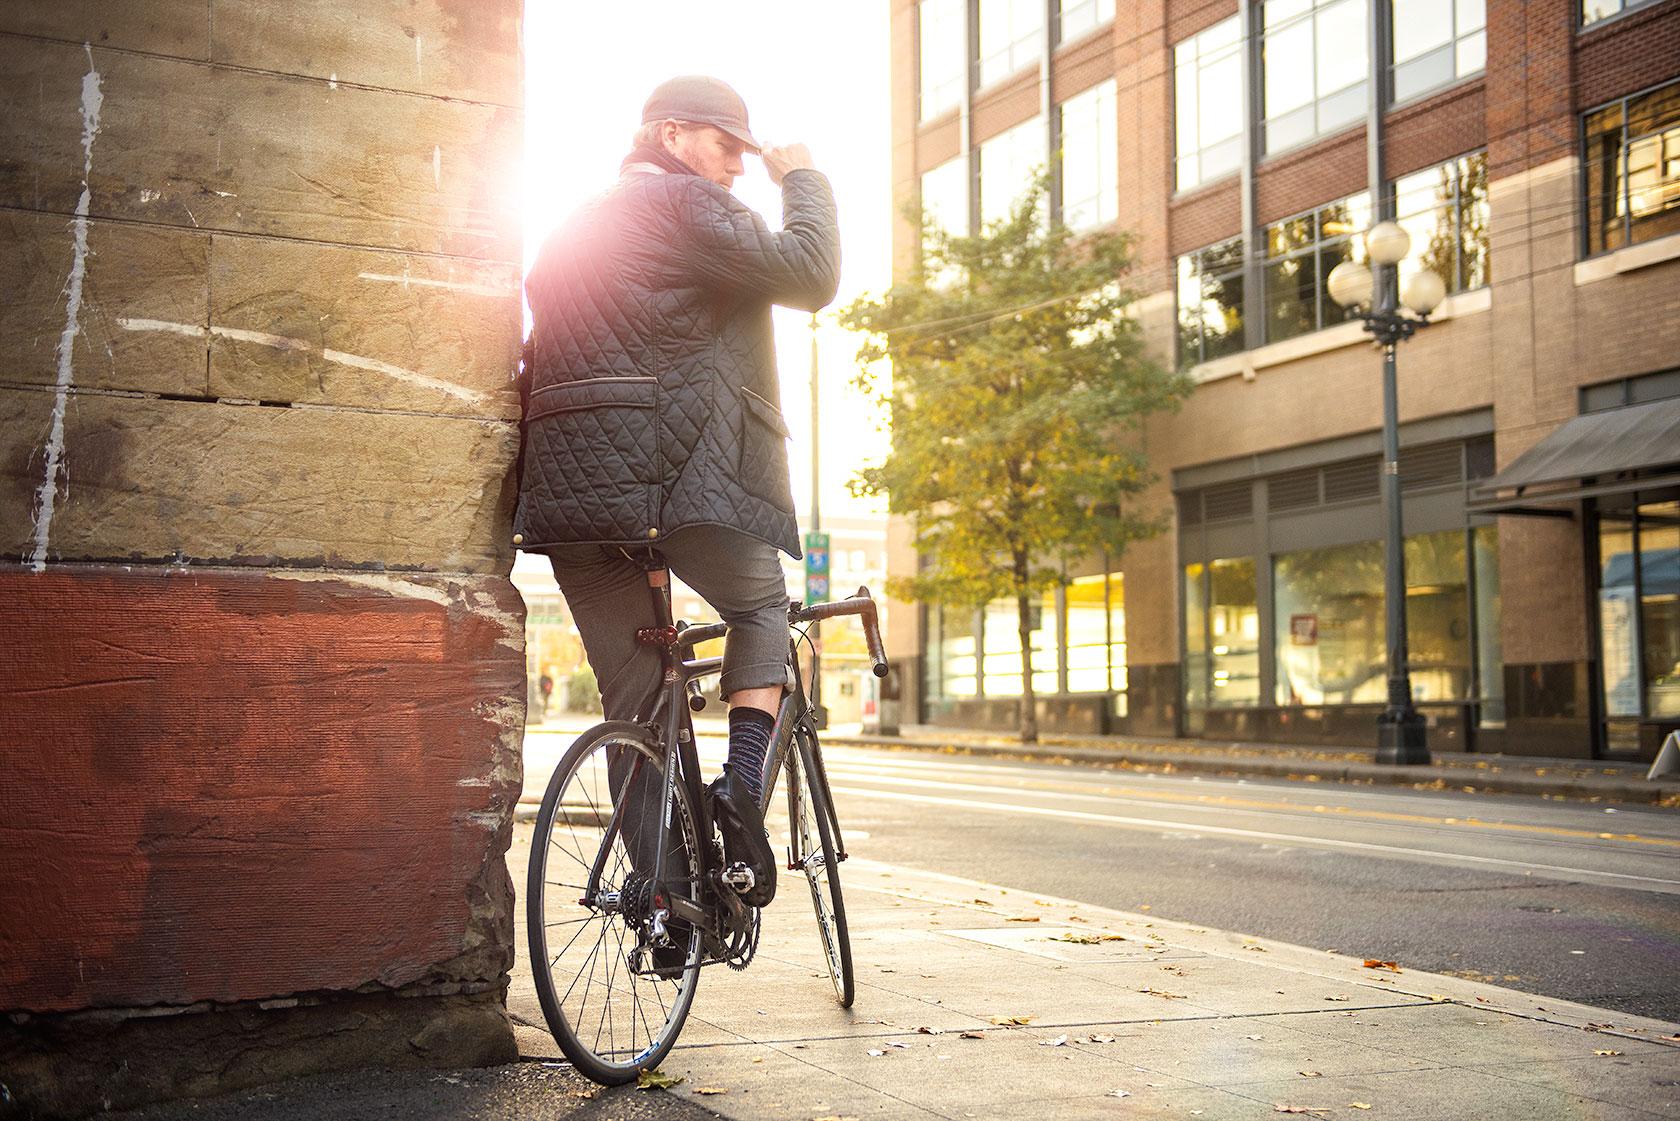 austin-trigg-seattle-bicycle-company-lifestyle-hat-apparel.jpg